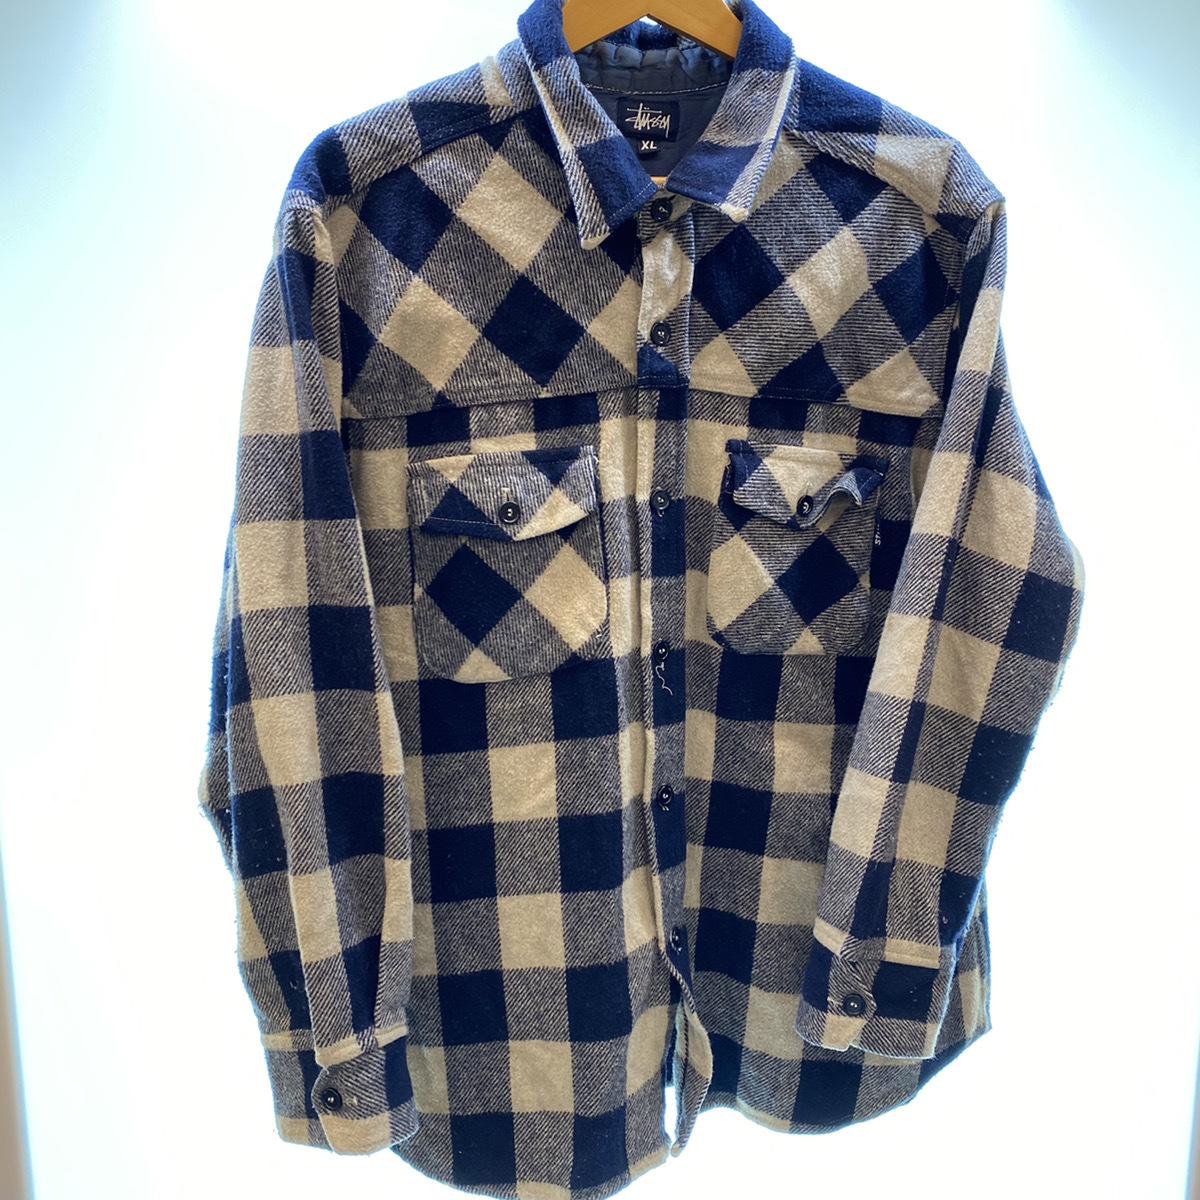 ●Stussy ステューシー OLD Stussy オールドステューシー 90s 90年代 紺タグ チェック ウール シャツ USA製 MADE IN USA 104_画像2